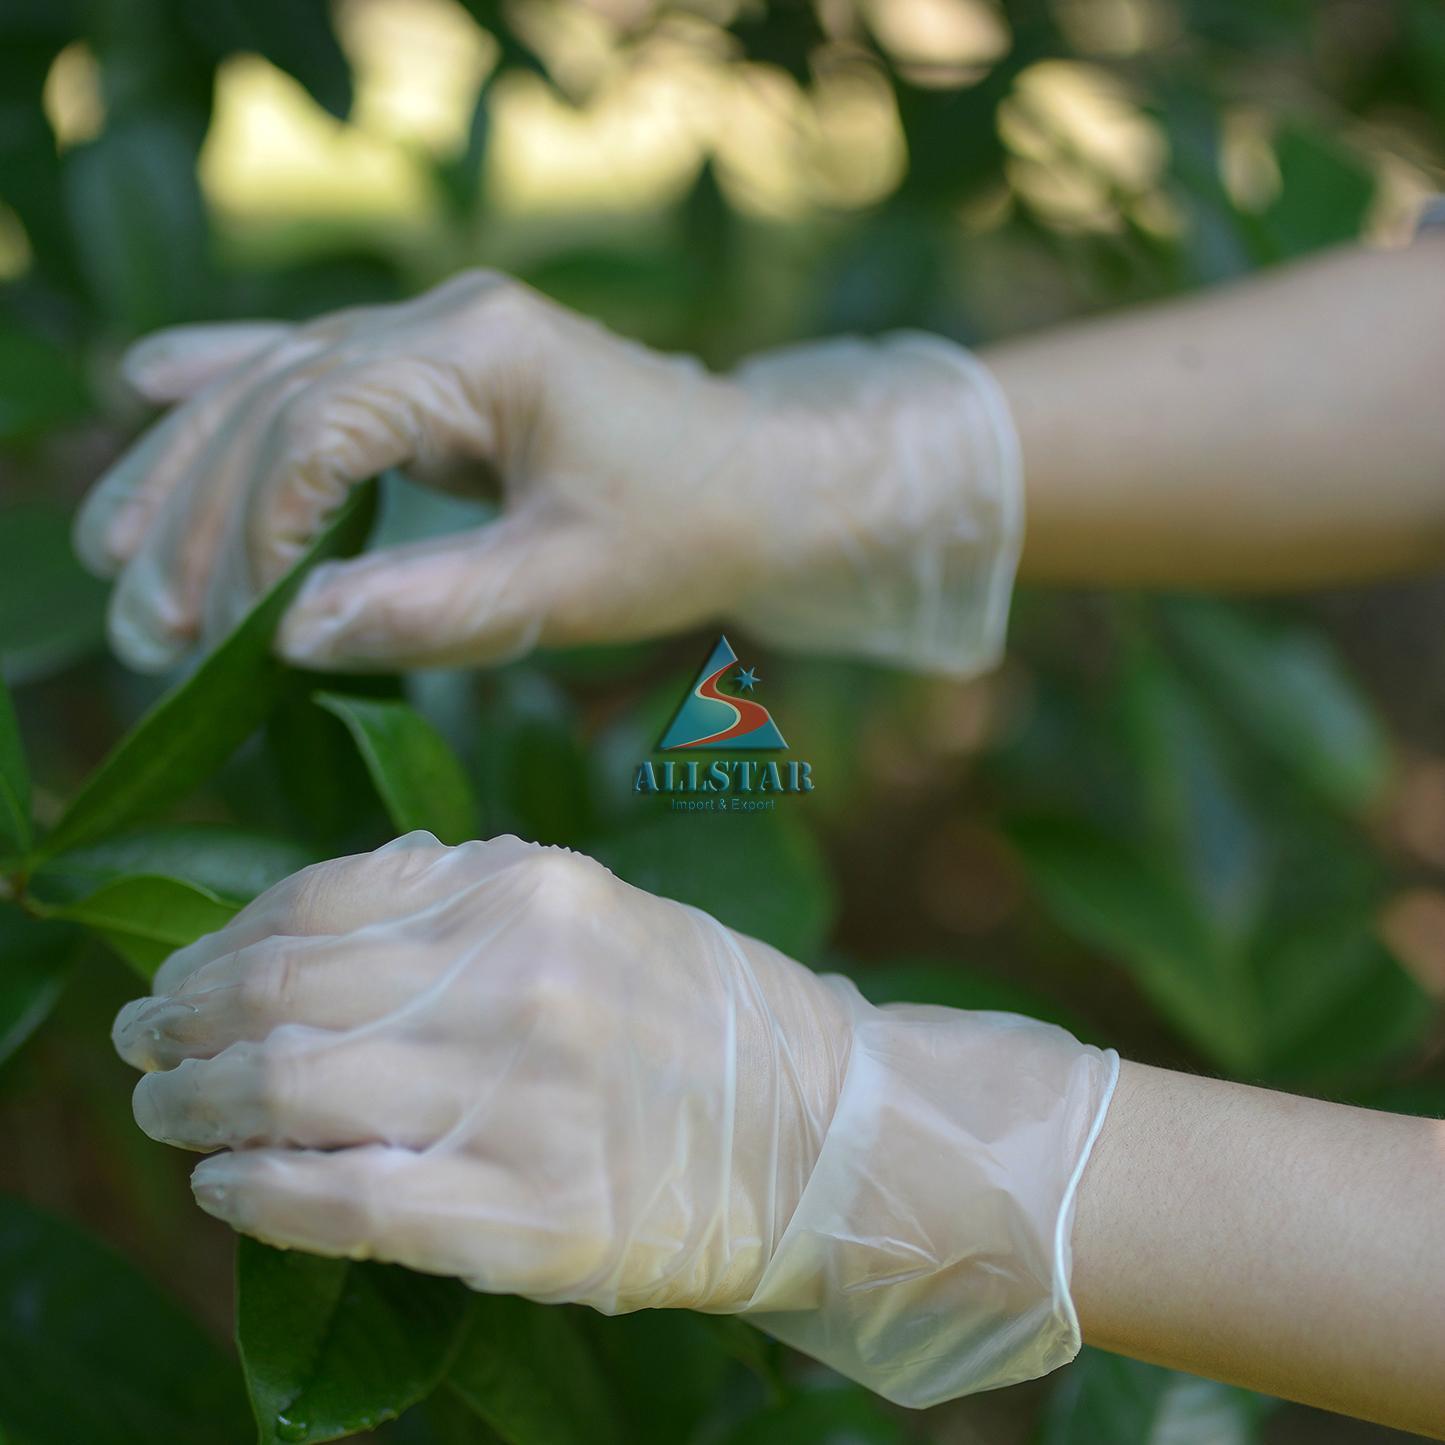 PVC Glove 2